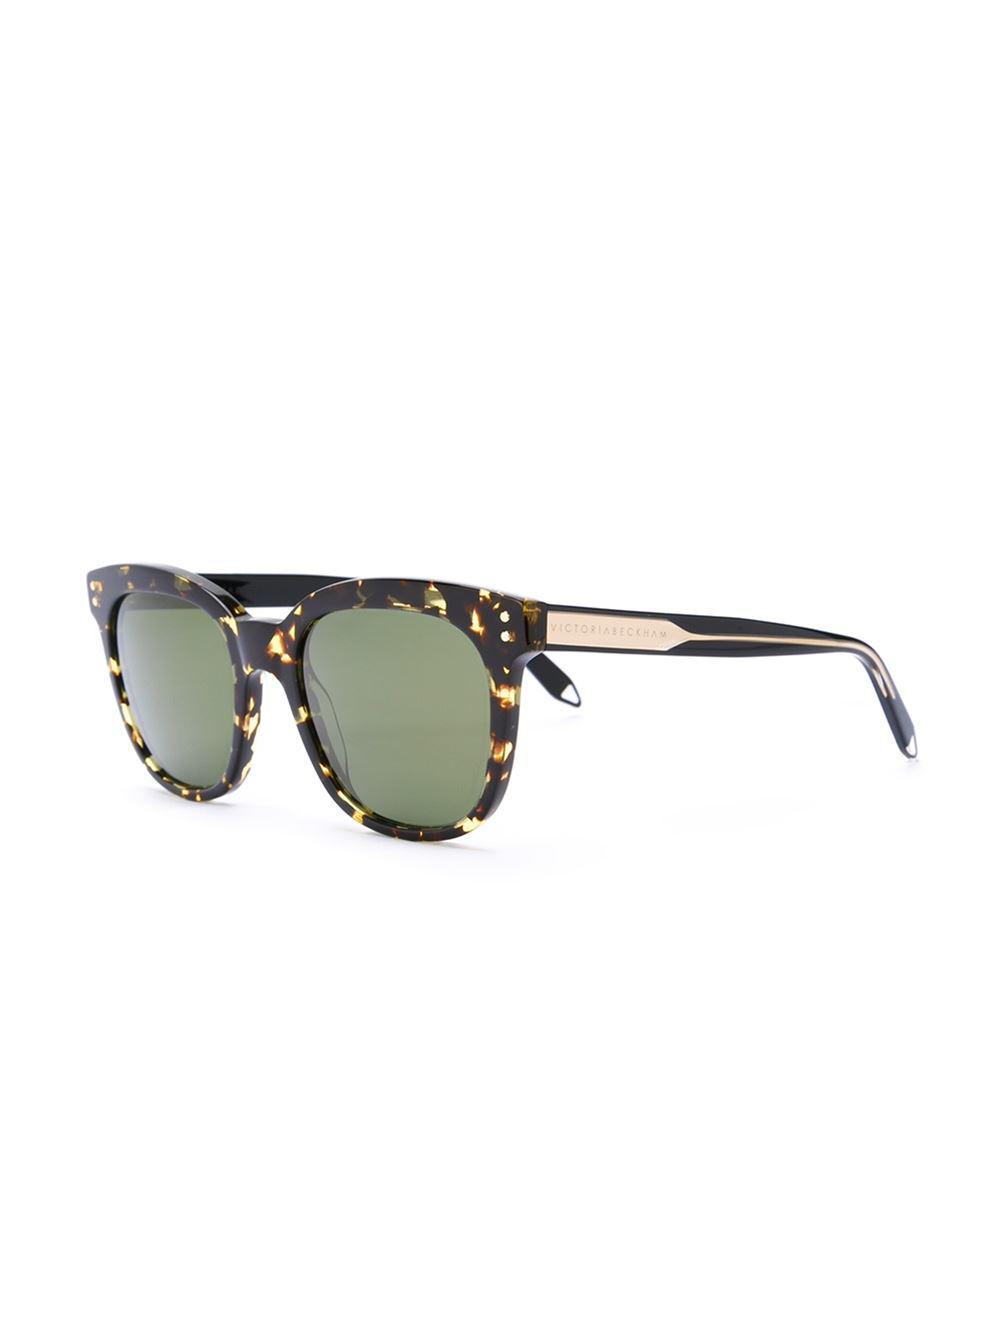 b40664020e Victoria Beckham  the Vb  Sunglasses in Brown - Lyst